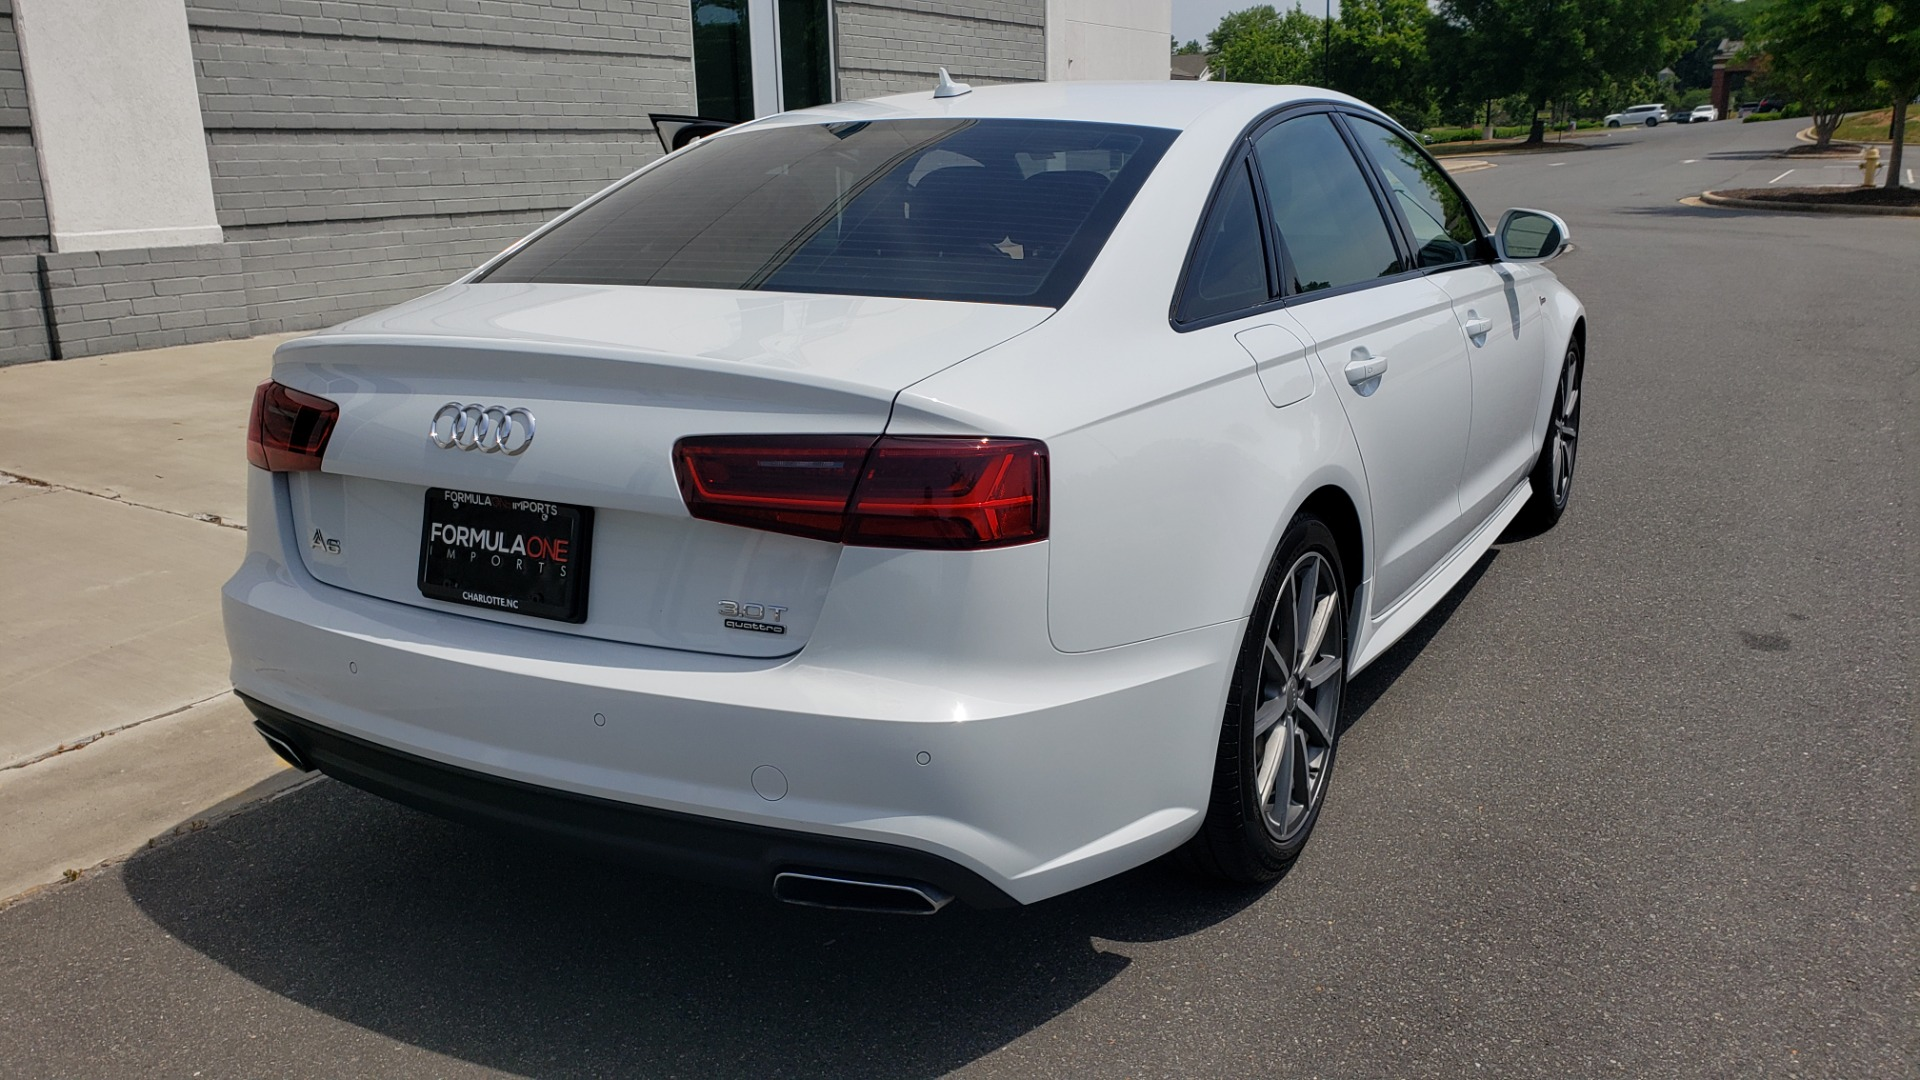 Used 2017 Audi A6 PRESTIGE SEDAN 3.0T / NAV / SUNROOF / BLACK OPTIC / CLD WTHR / REARVIEW for sale $30,797 at Formula Imports in Charlotte NC 28227 2